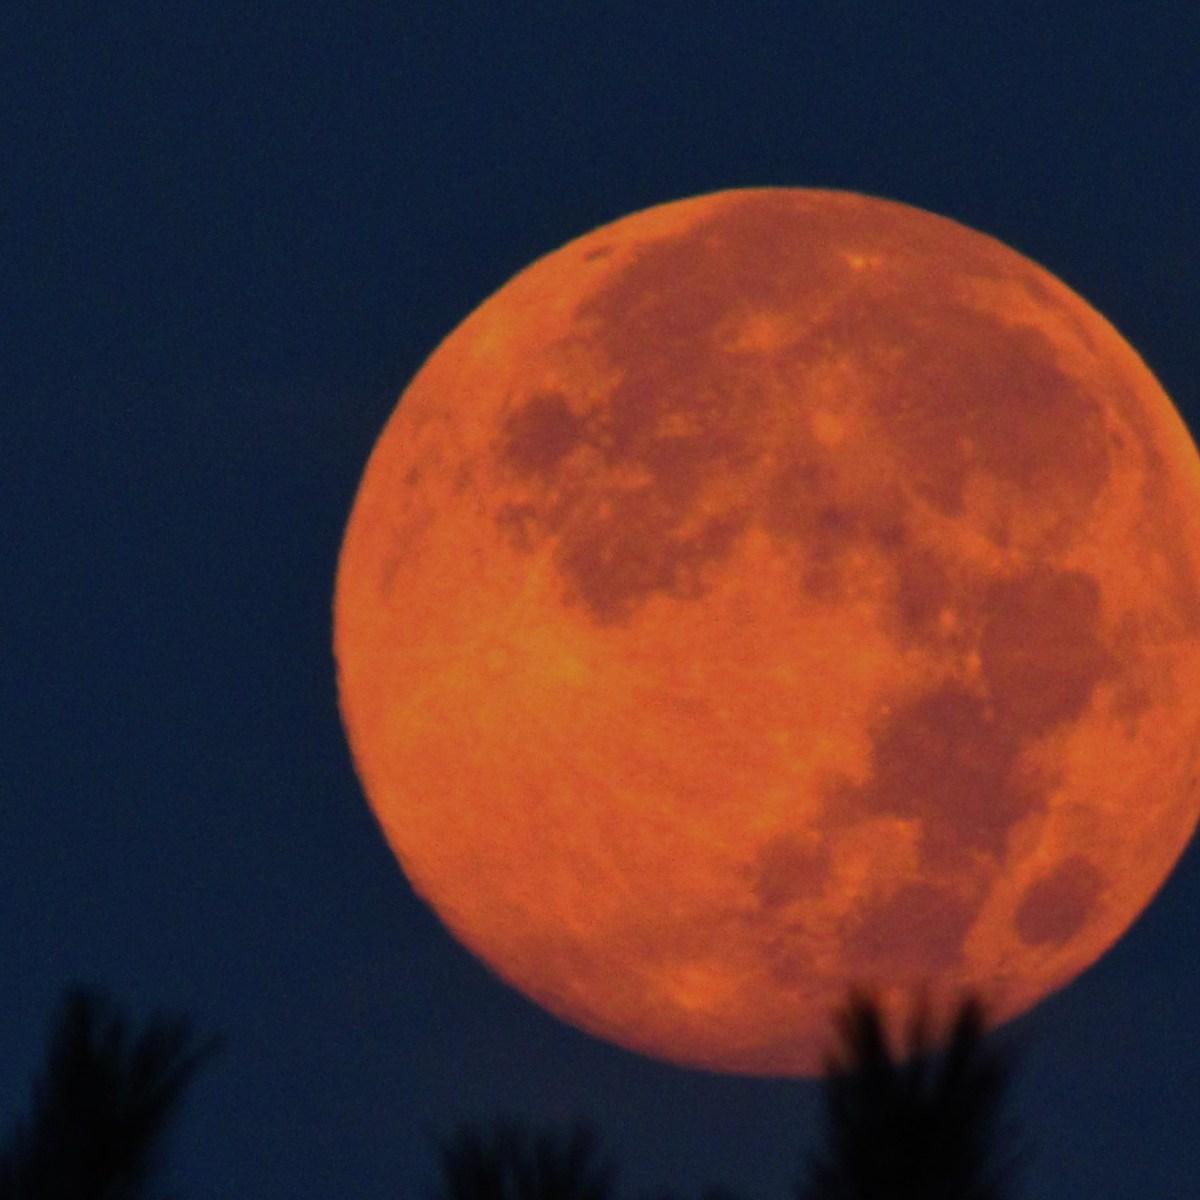 An orange-hued full moon against a dark purple sky